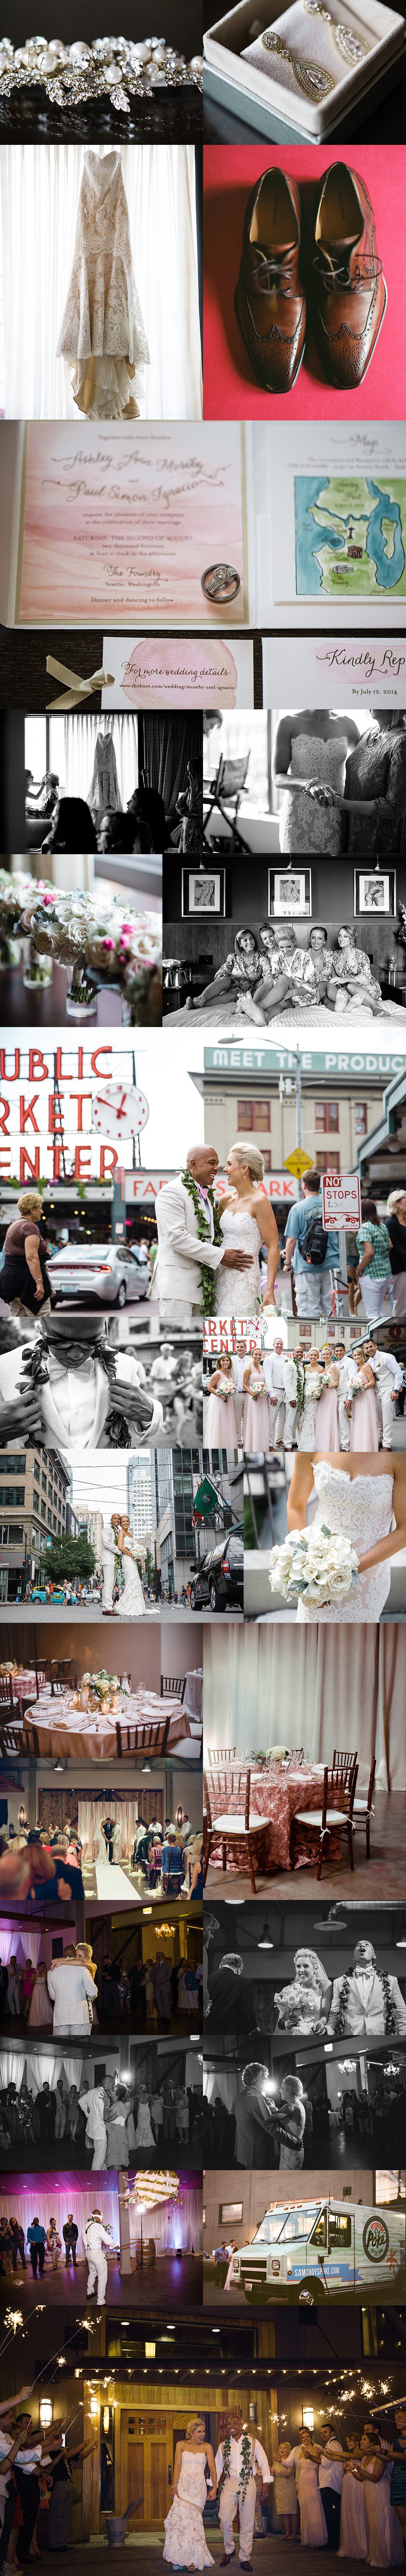 gphotoco_wedding_collage.jpg